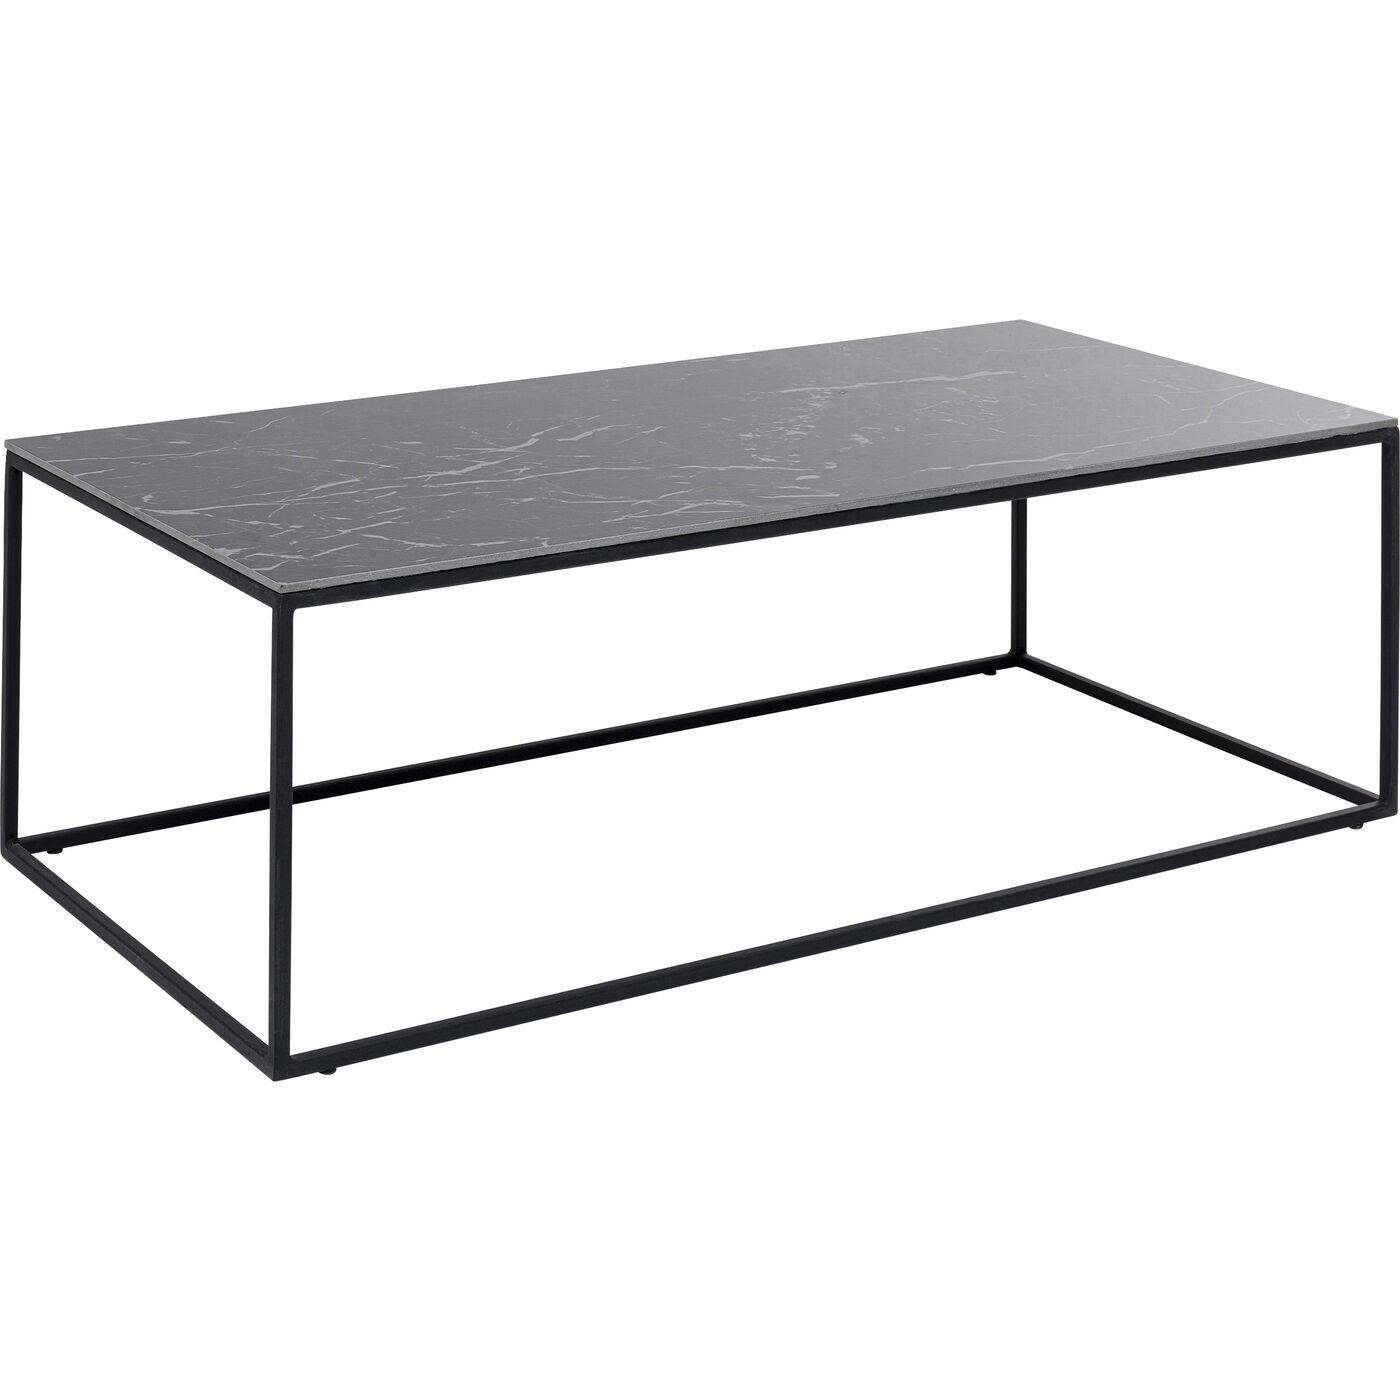 Table basse Greta 100x50cm noire Kare Design